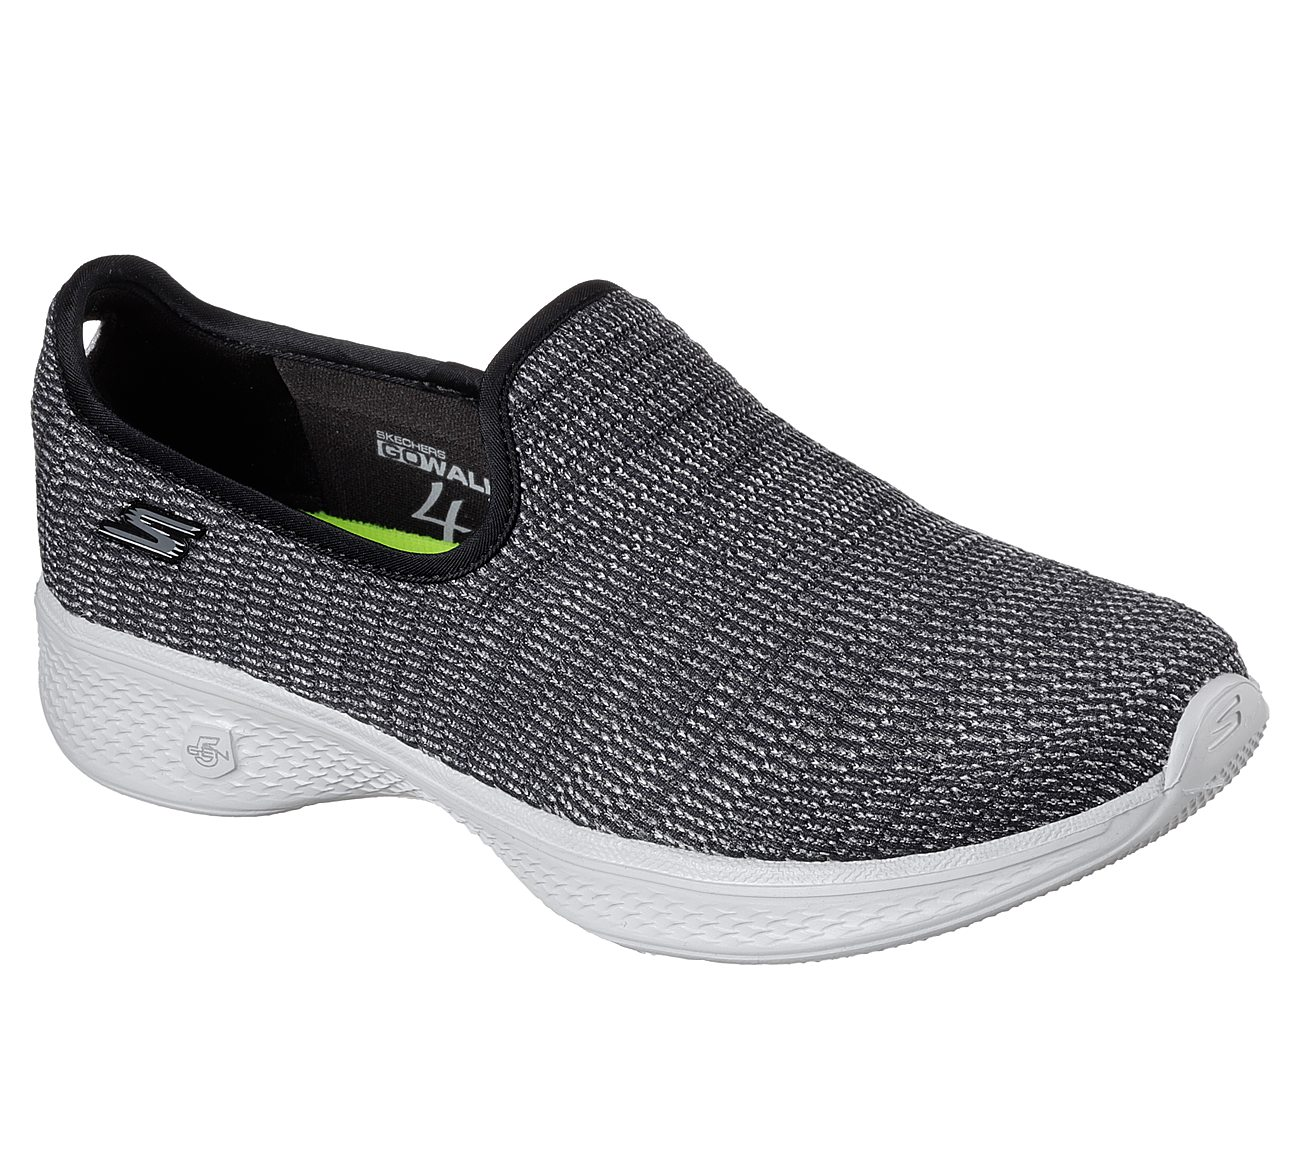 cheapest skechers go walk shoes